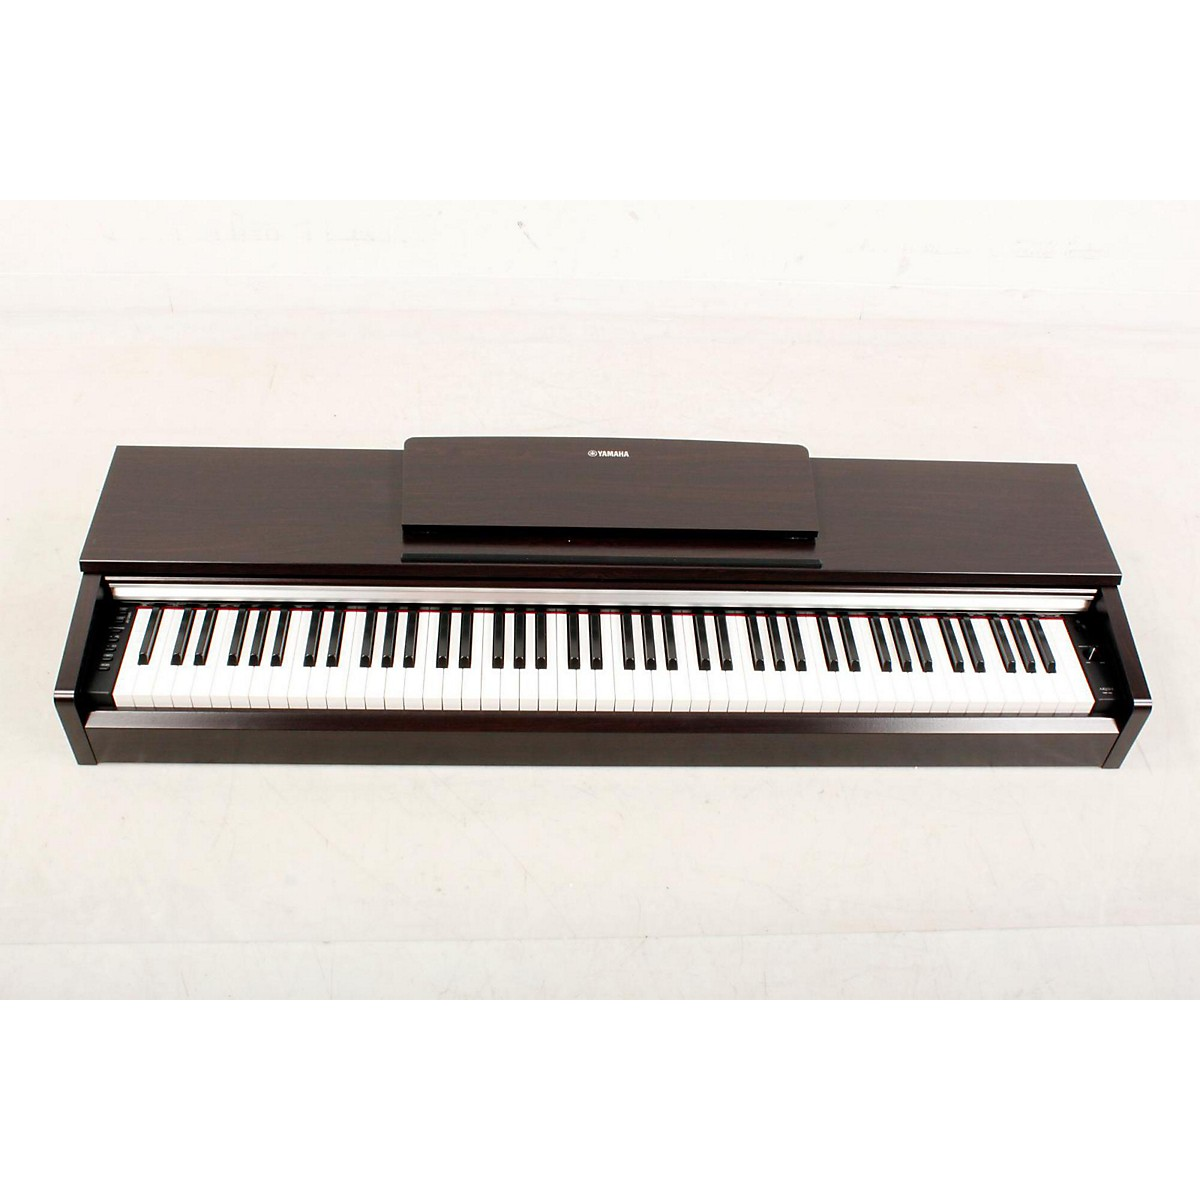 Yamaha Arius YDP-142 88-Key Digital Piano with Bench